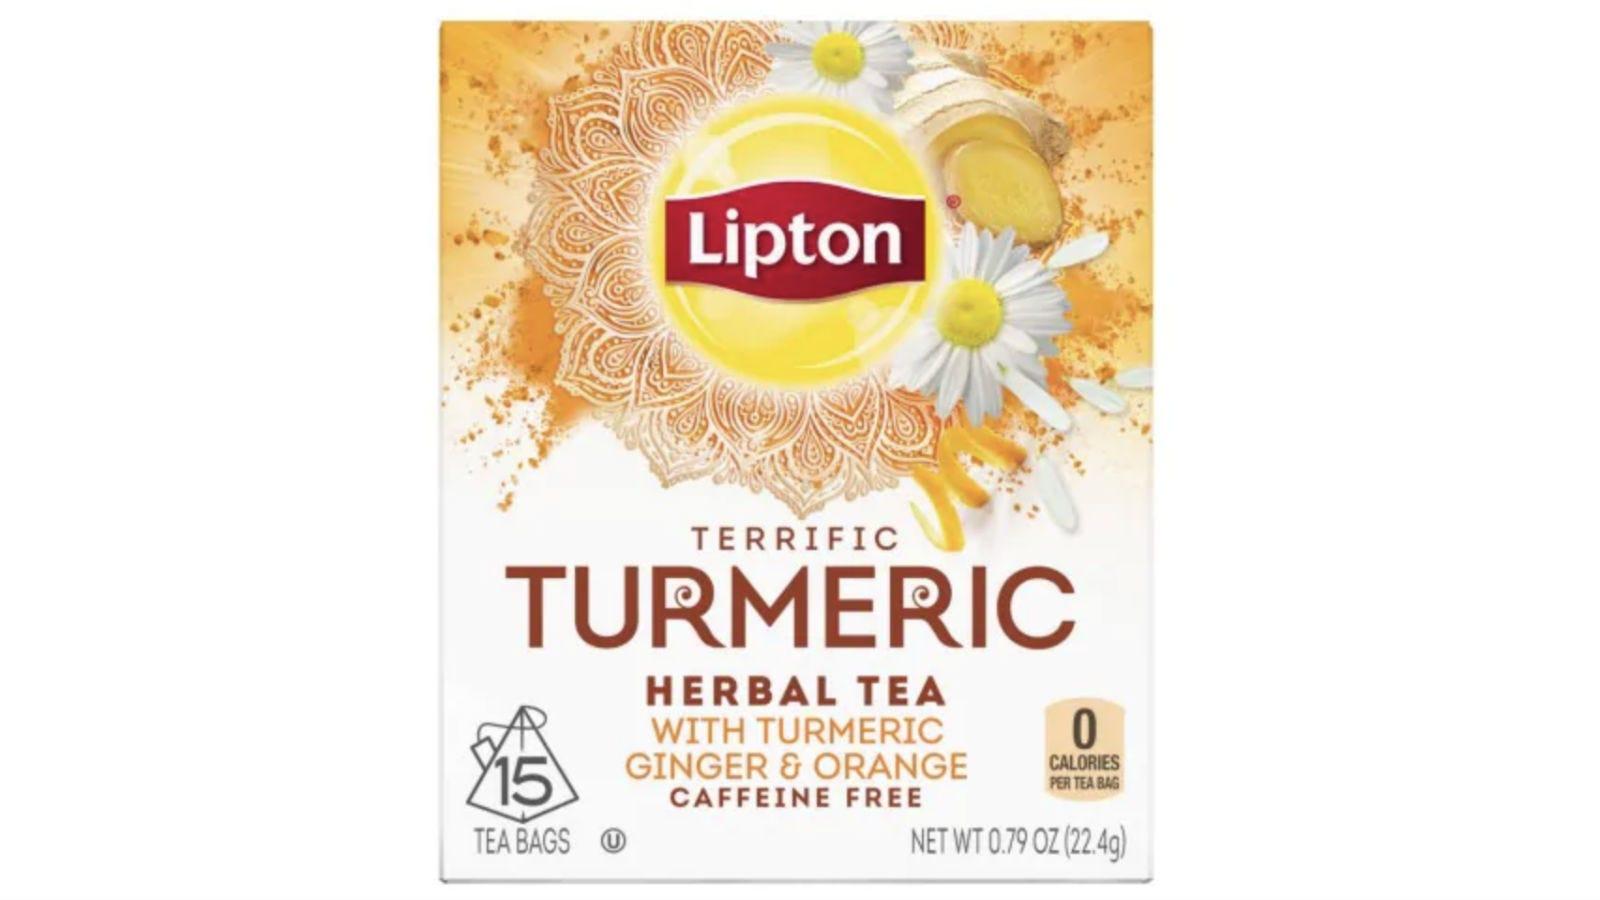 A box of Lipton Terrific Turmeric Tea.